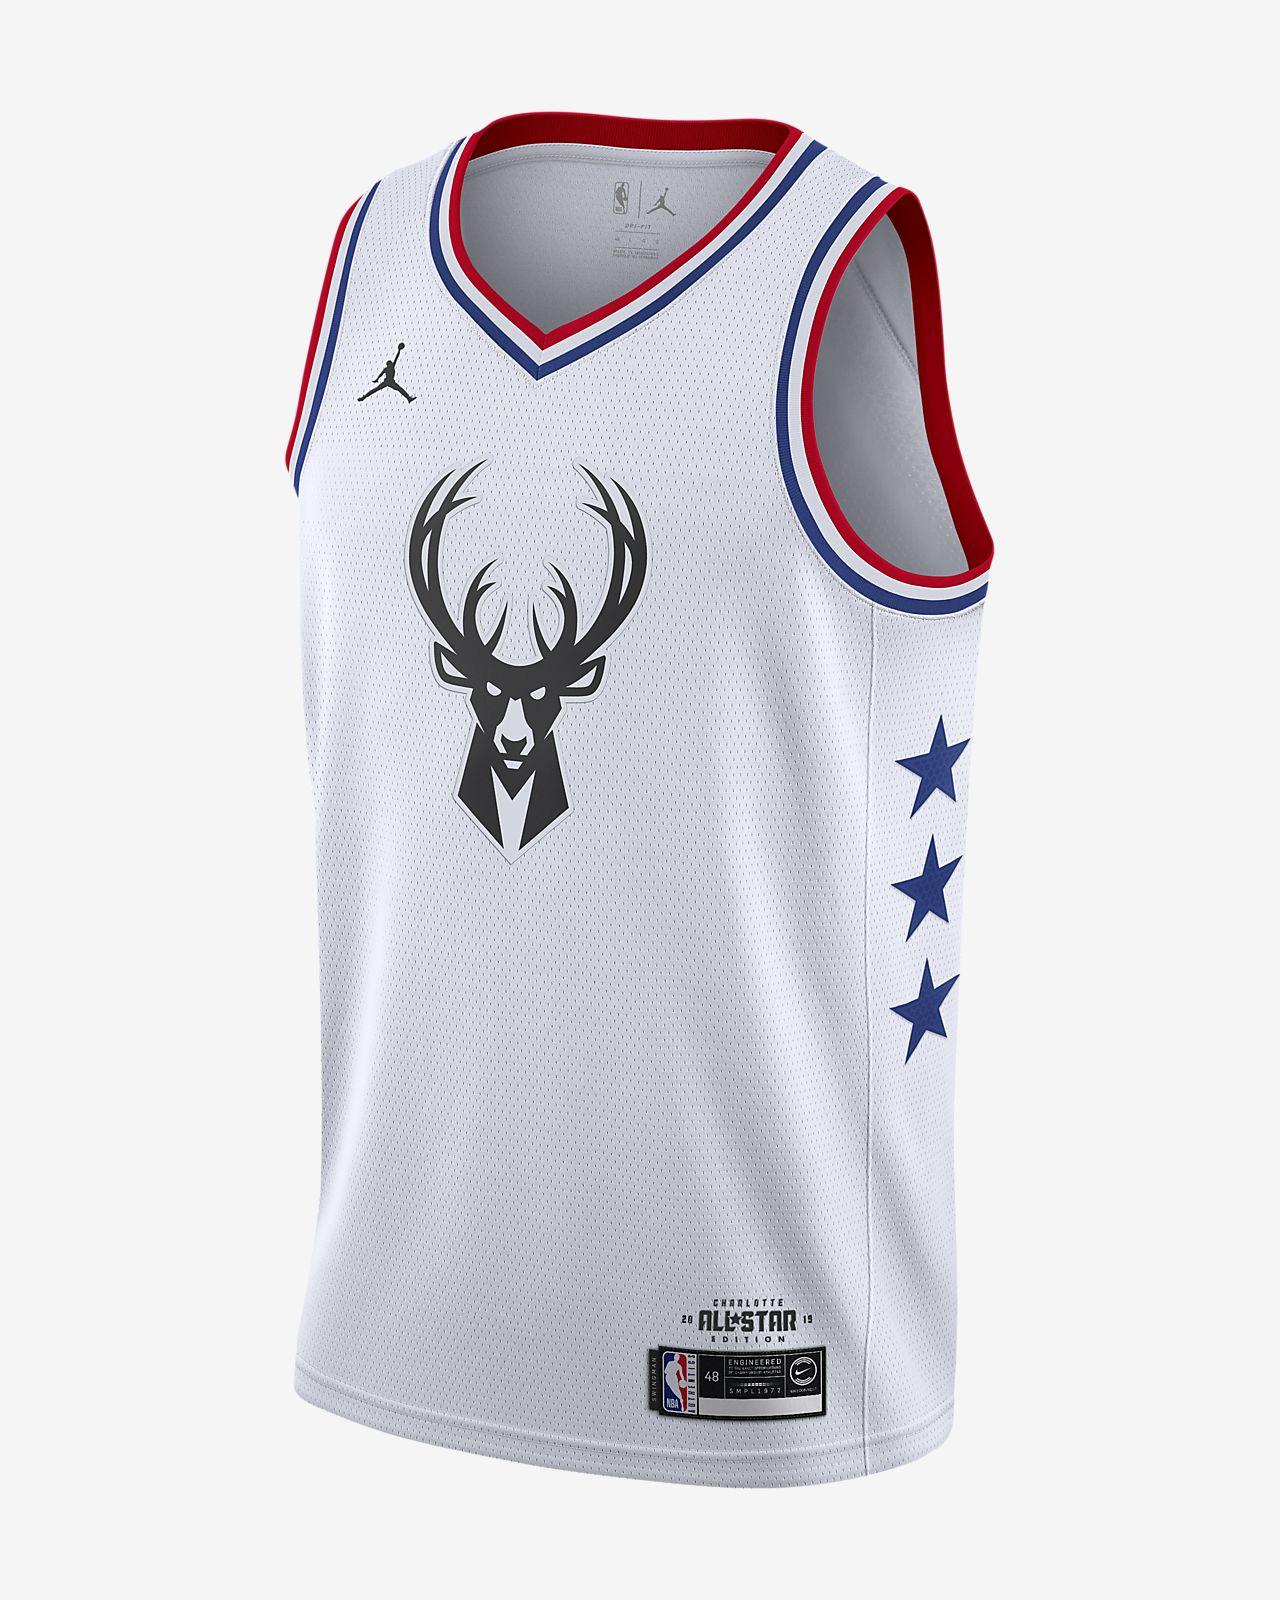 Men s Jordan NBA Connected Jersey. Giannis Antetokounmpo All-Star Edition  Swingman 767498754